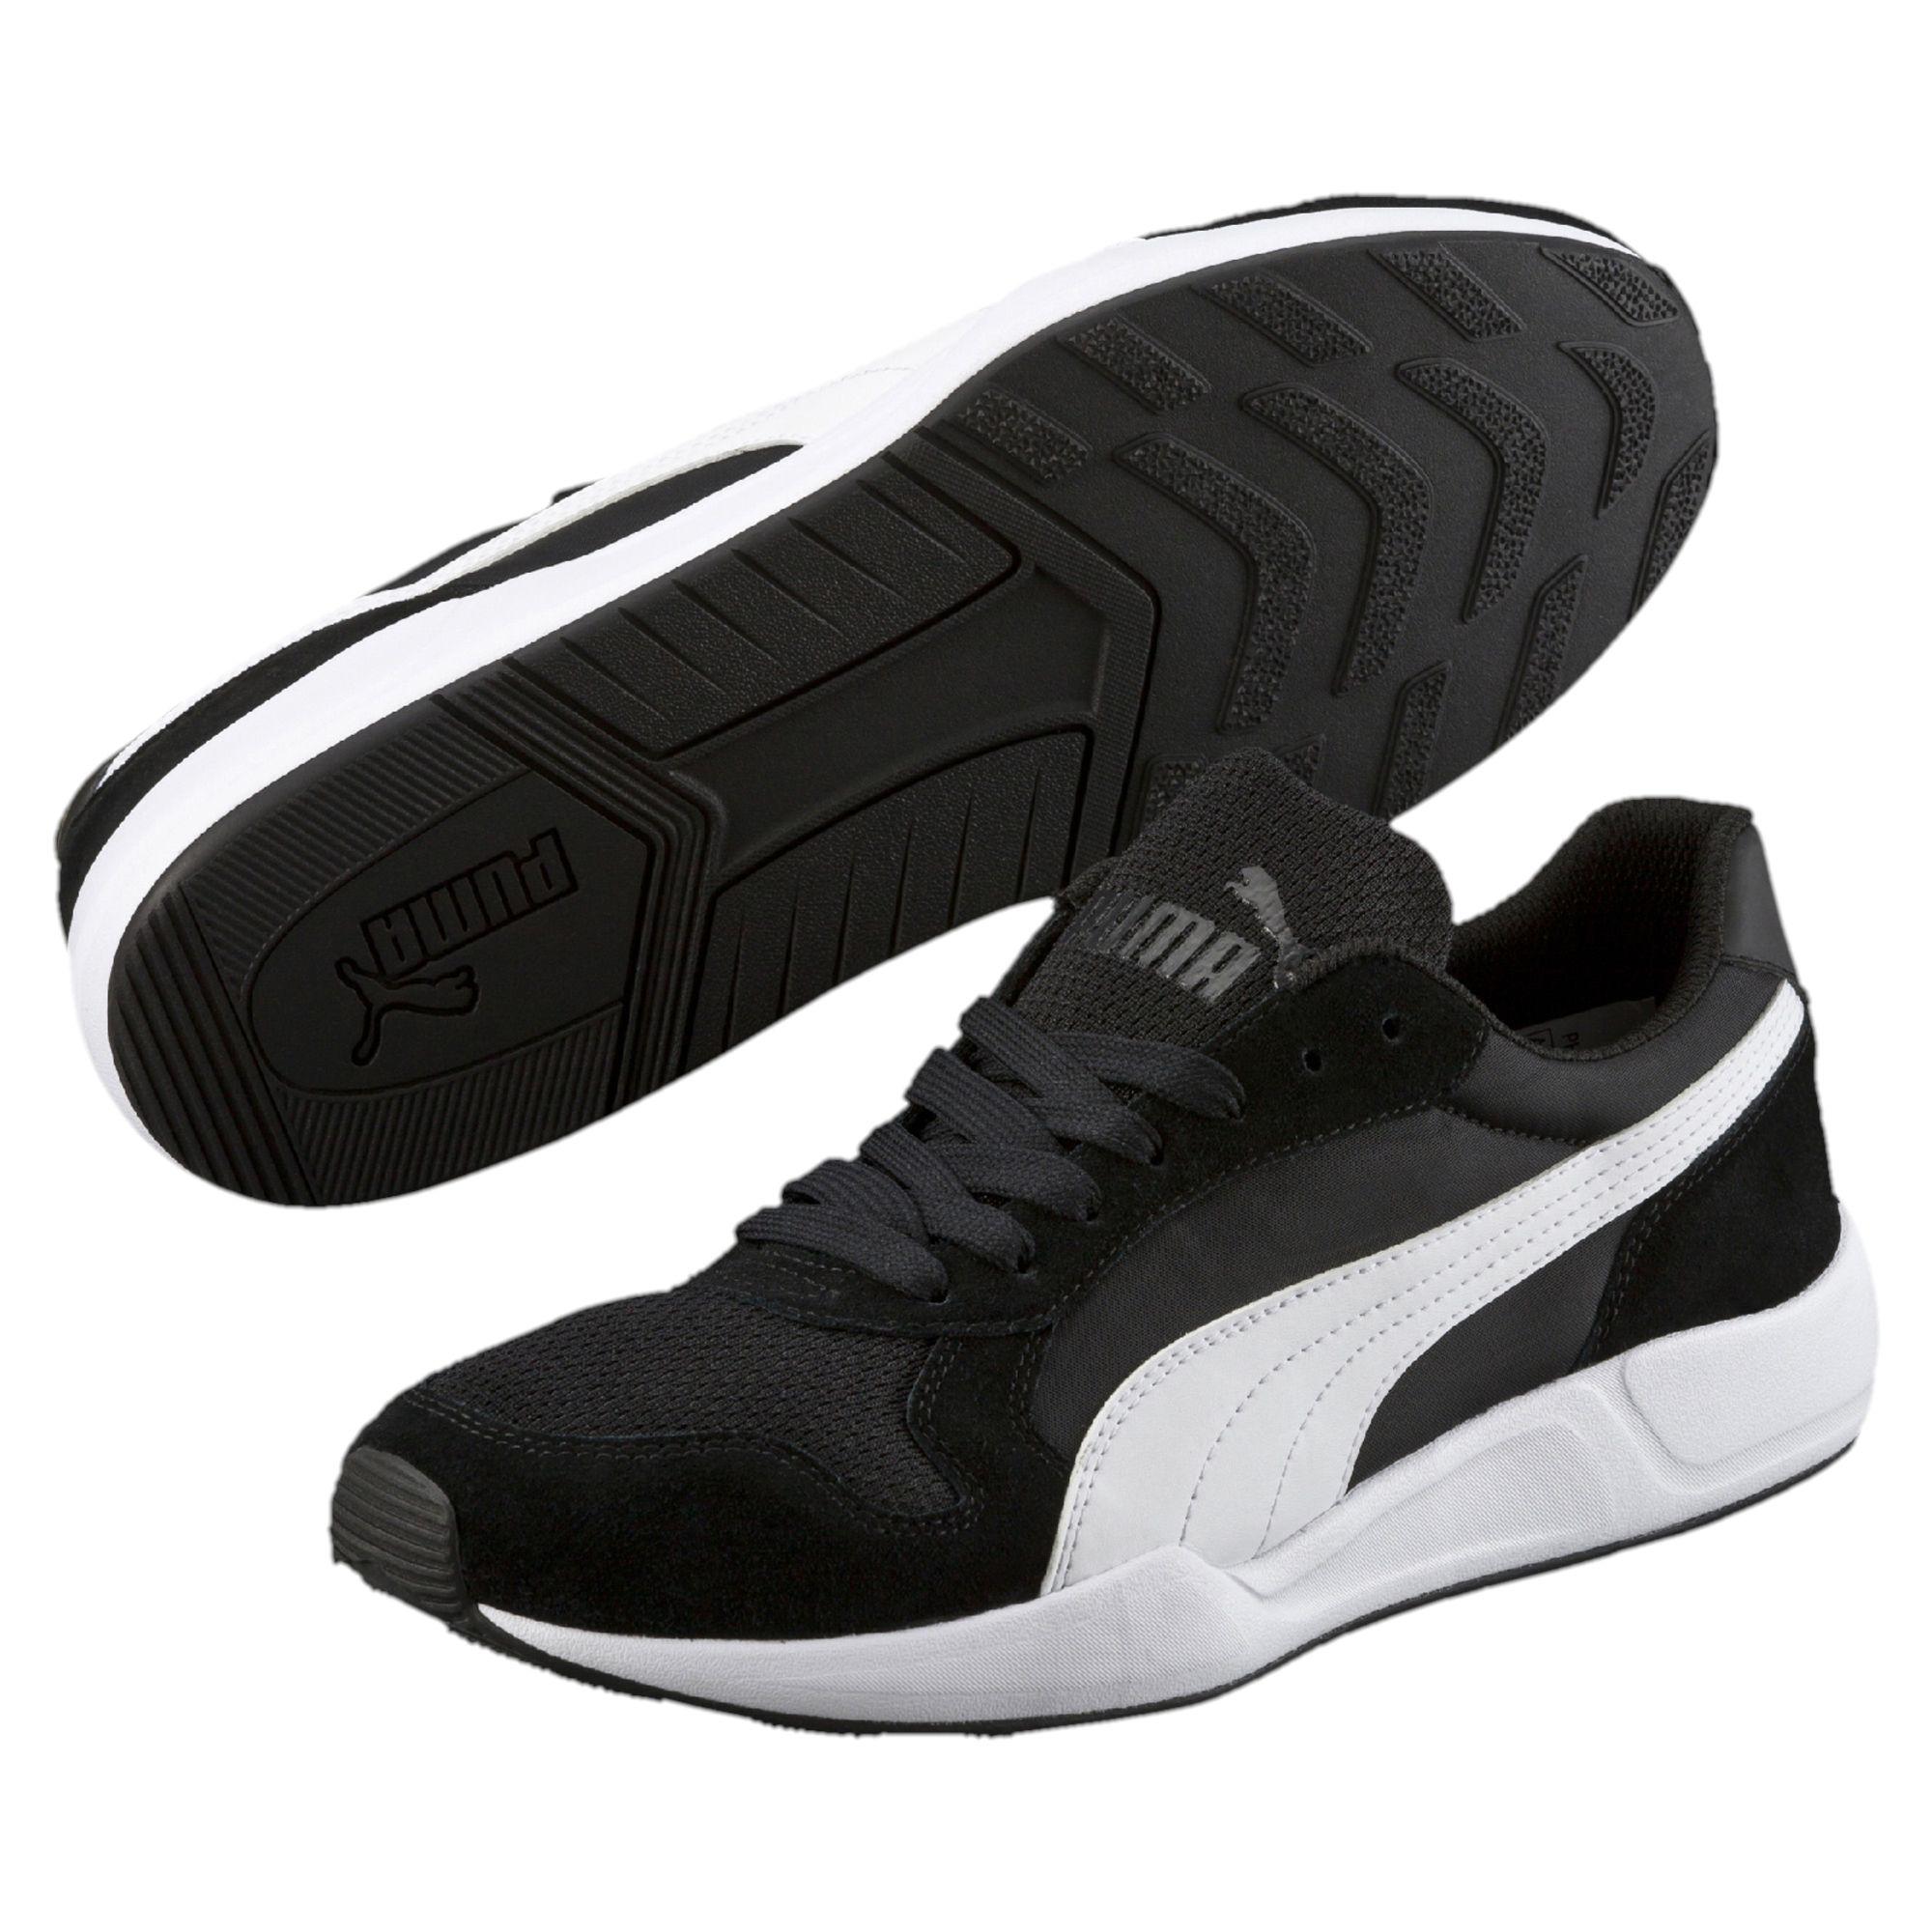 puma st runner plus sneaker basics schuhe m nner neu ebay. Black Bedroom Furniture Sets. Home Design Ideas